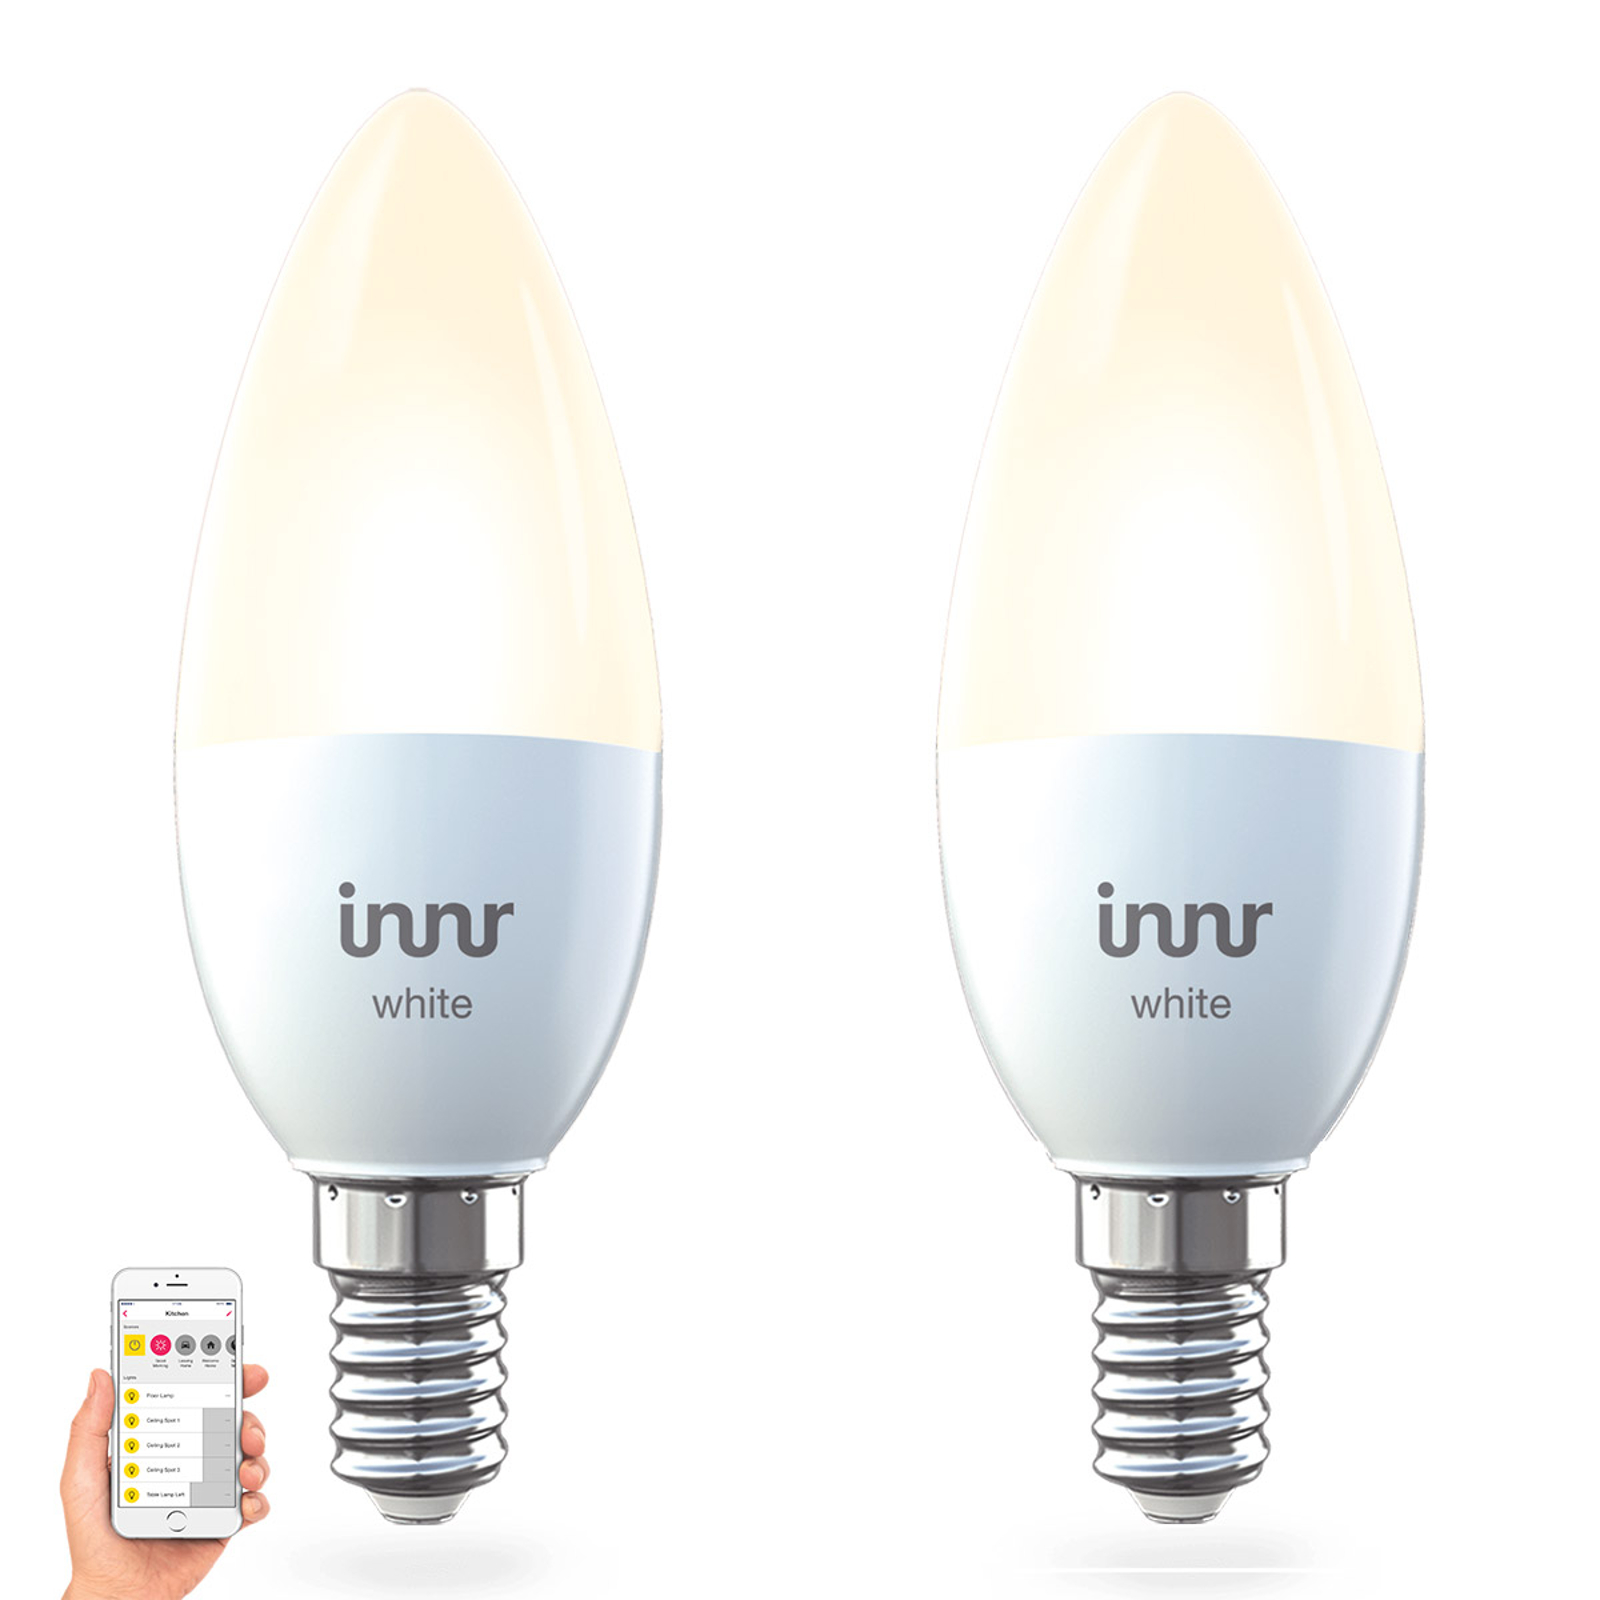 E14 5,3 W LED lamp Innr Smart Candle white, per 2